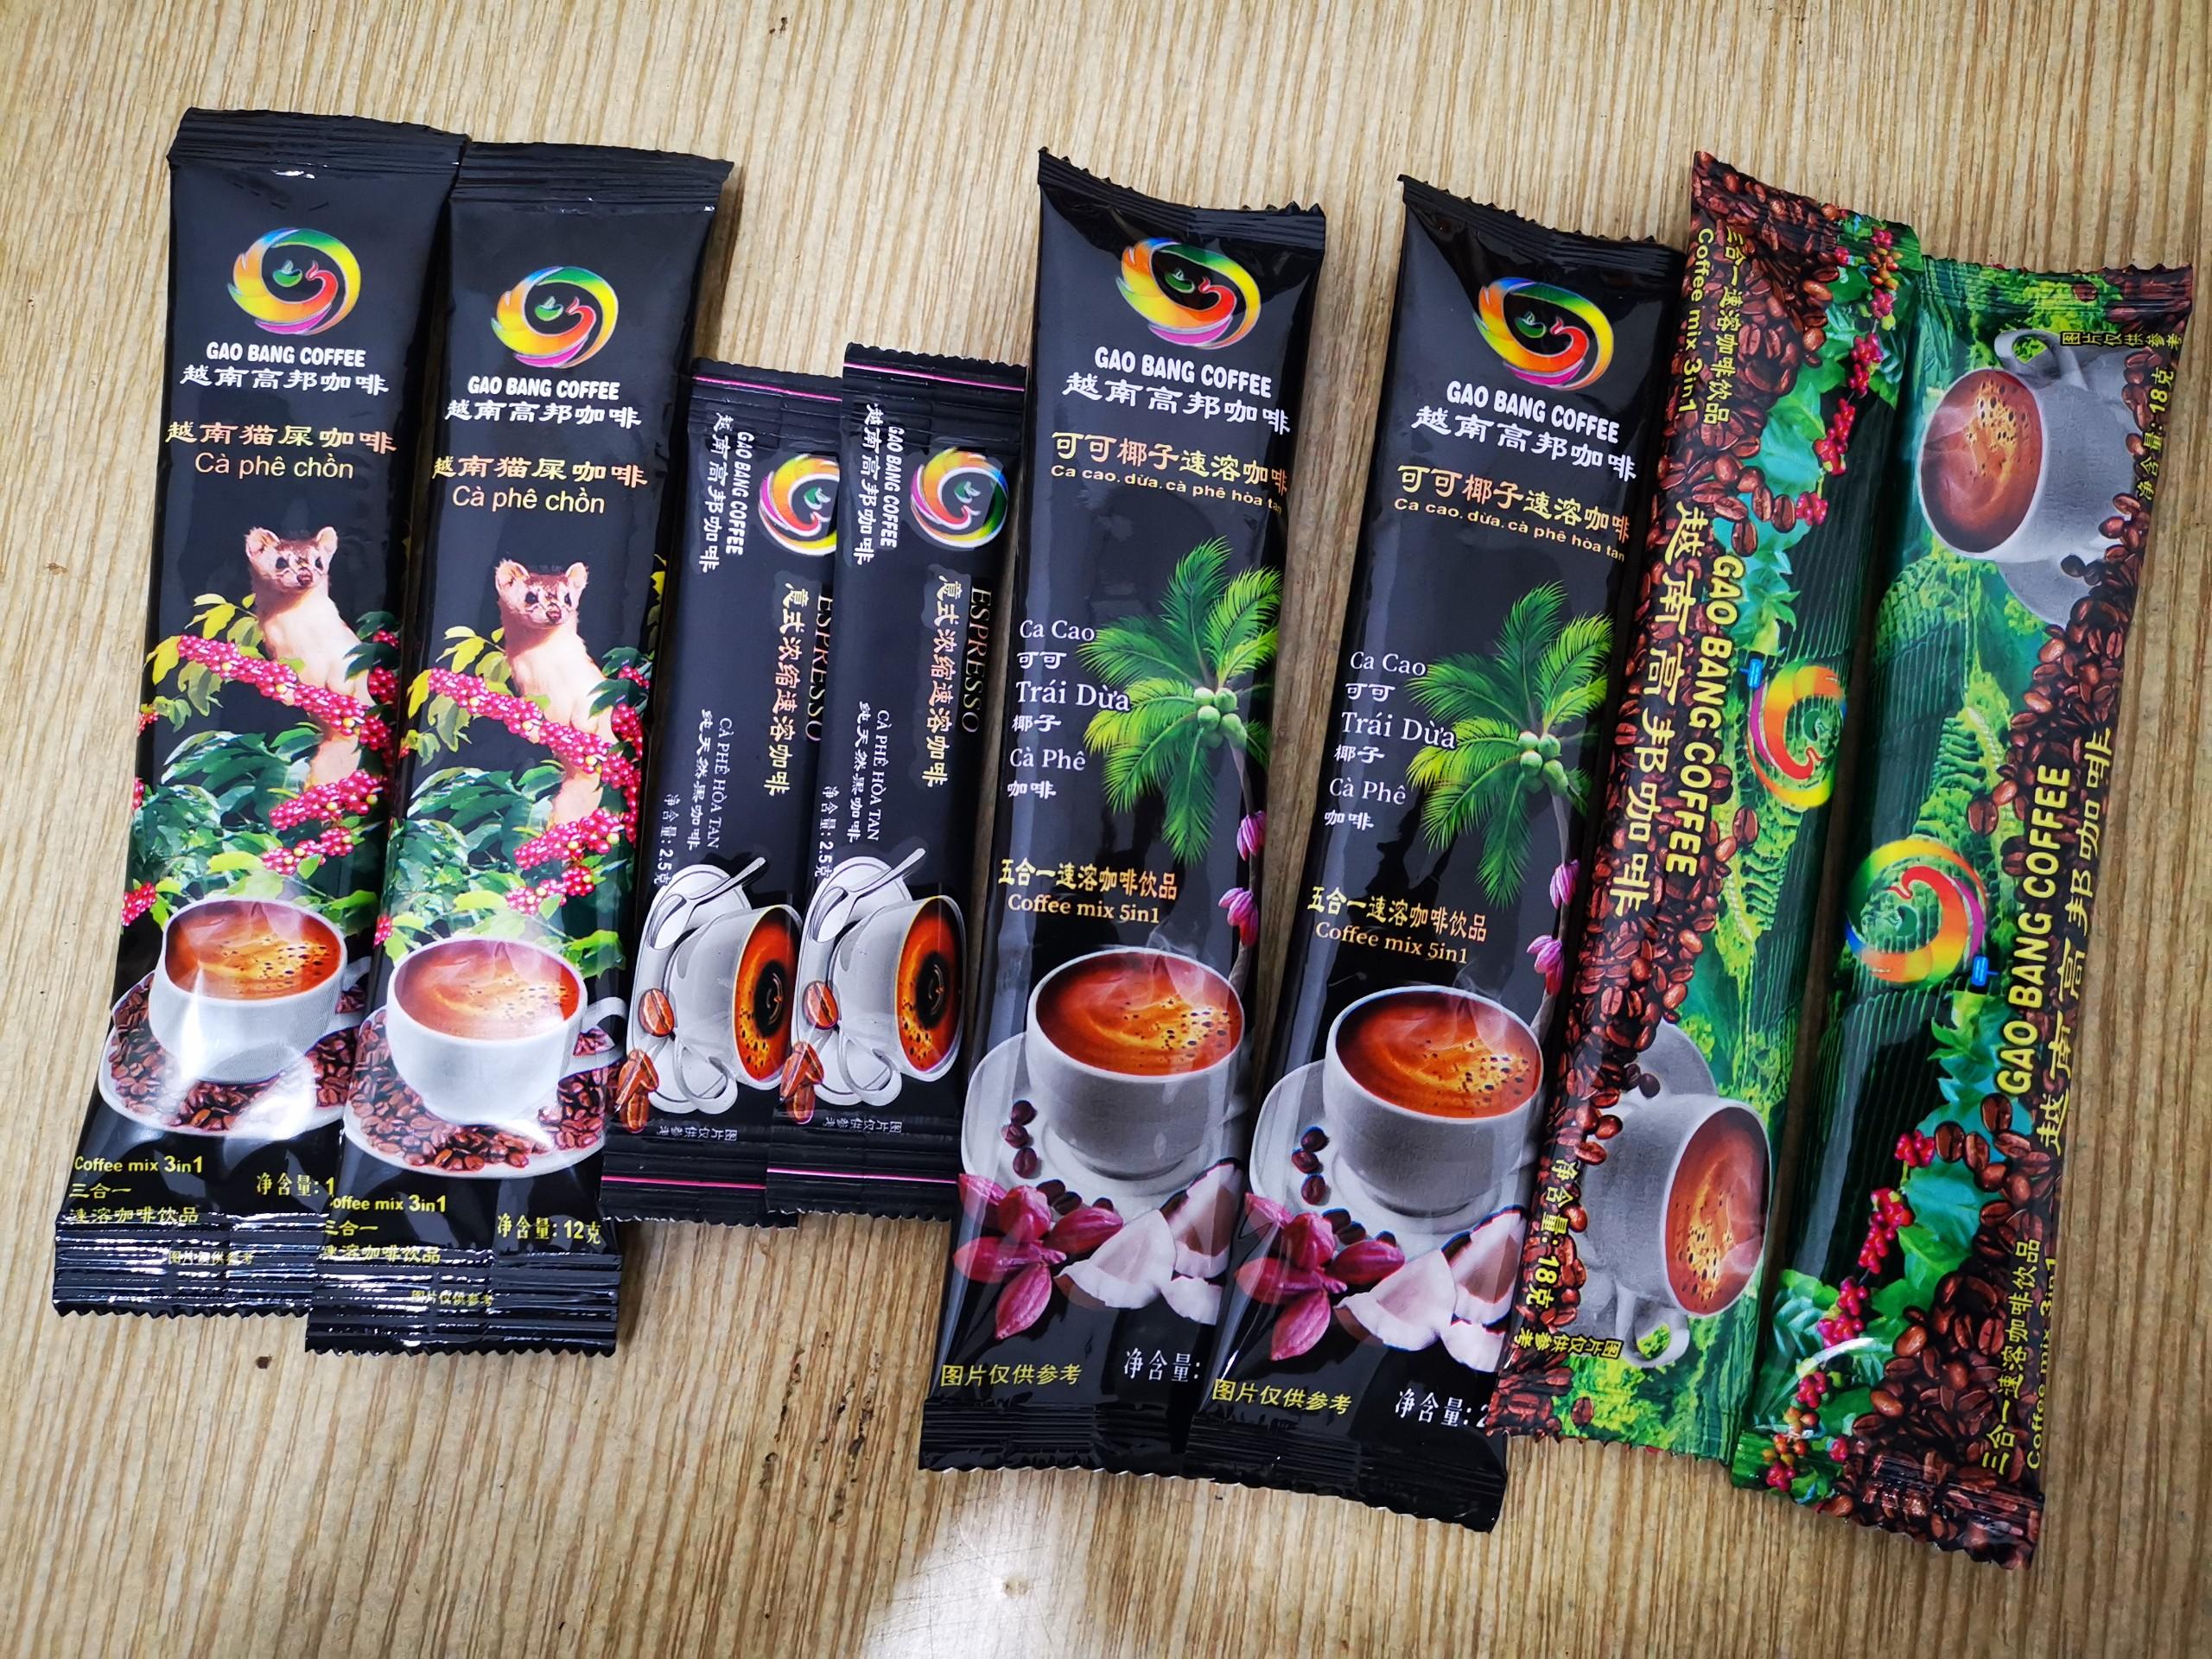 Gaobang 3in1 Coffee Instant Powder 12gram Vietnam